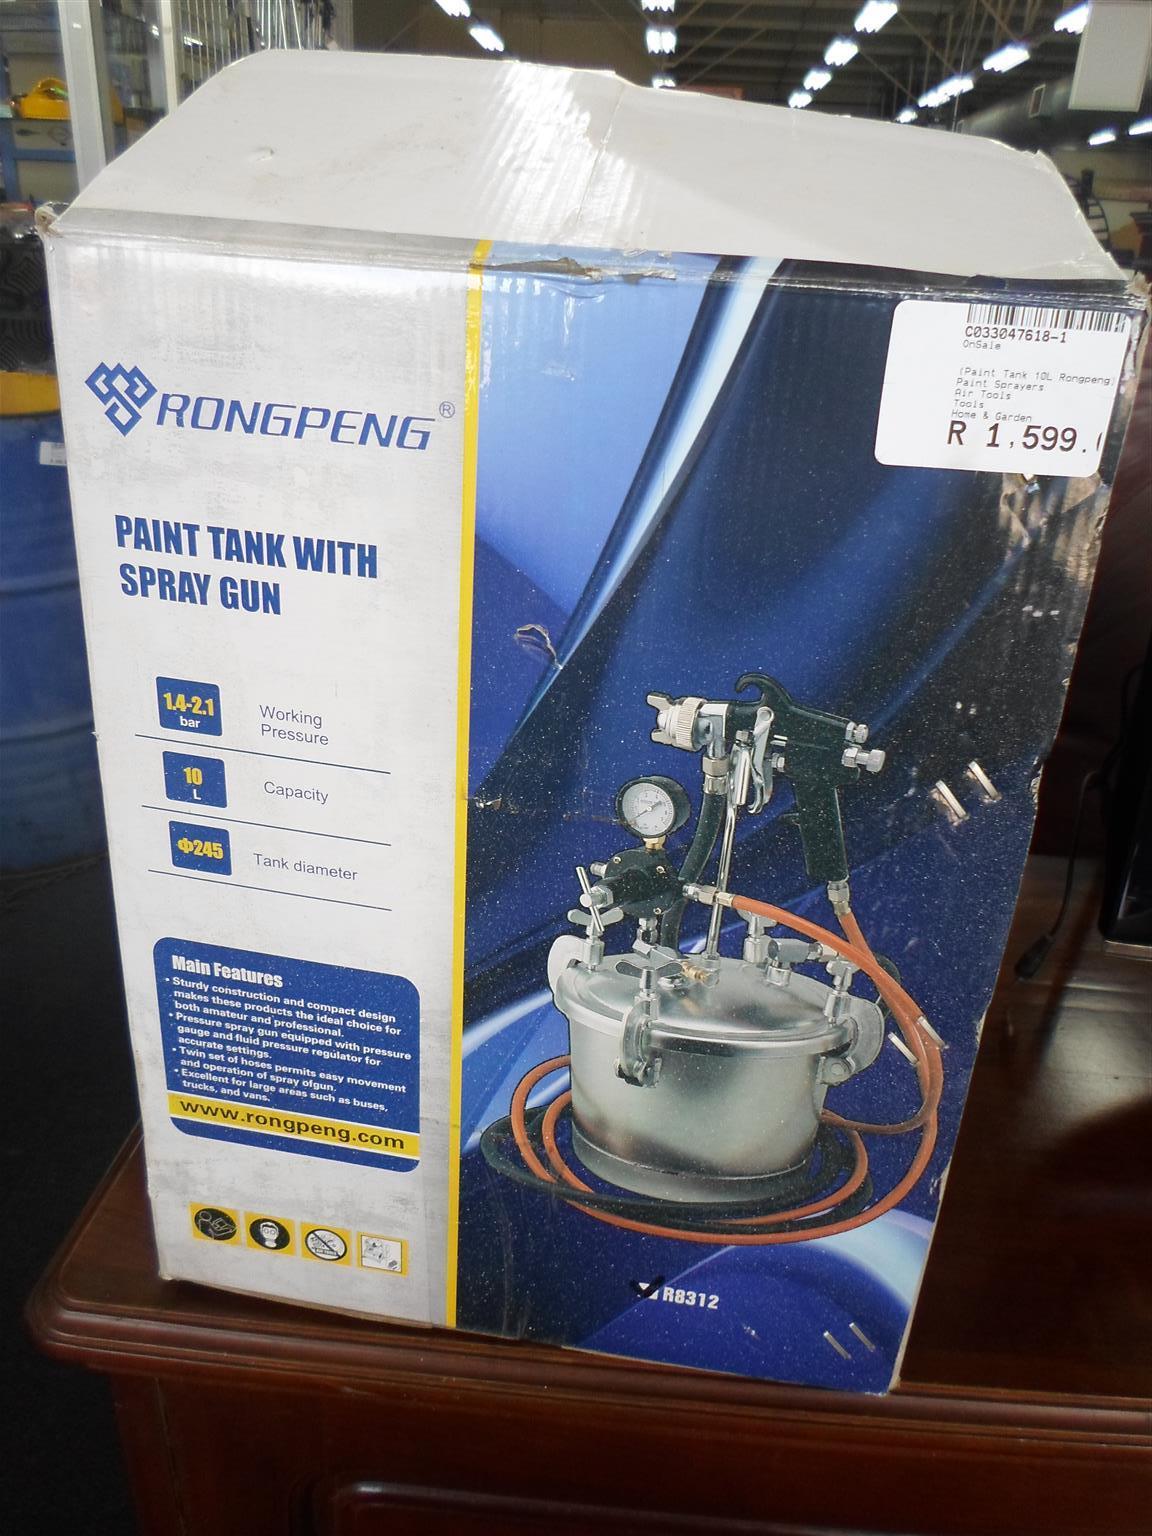 Rongpeng Paint Tank with Spraygun